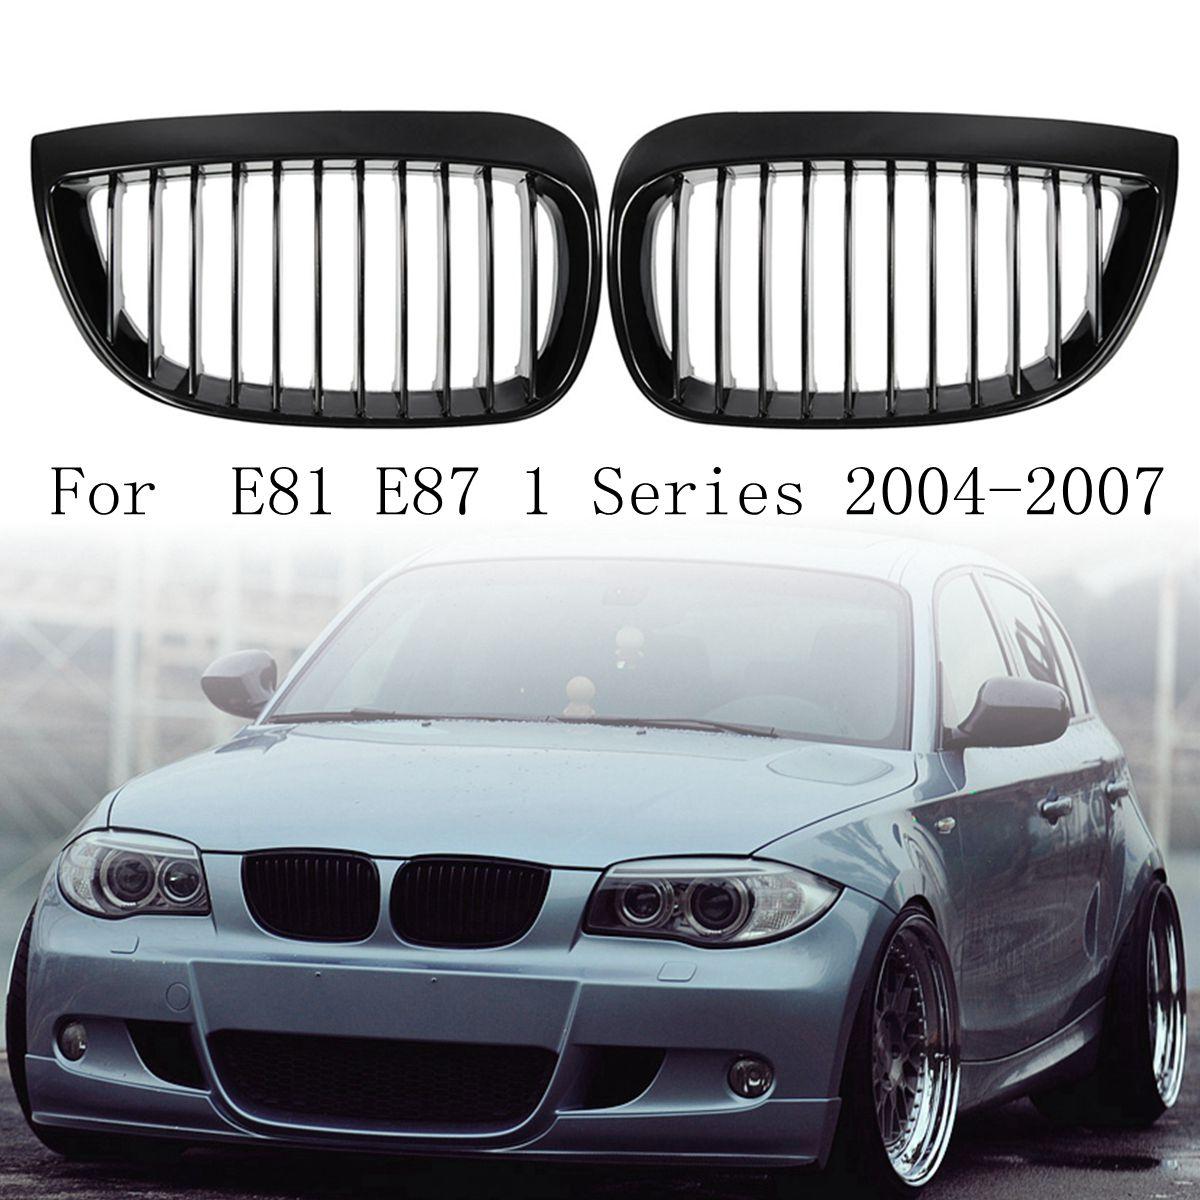 for BMW E87 E81 1 Series 2004 2007 Pair Left & Right Car Front Sport Kidney Grill Grilles Matt Black